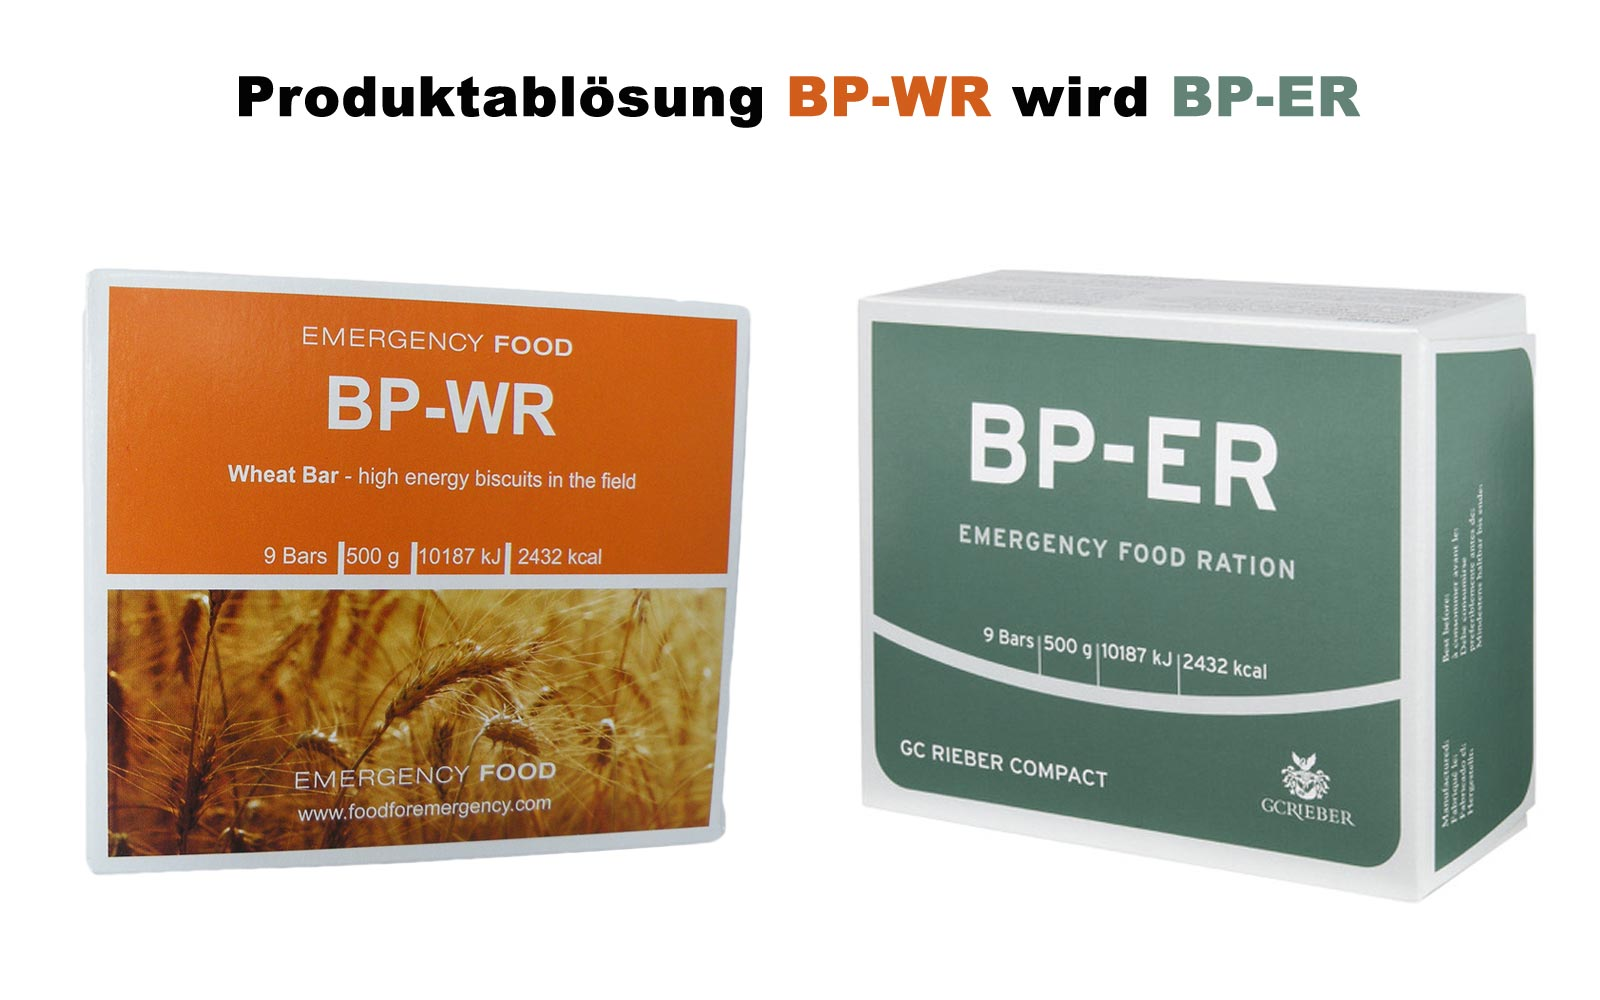 Produktablo-sung-BP-WR-wird-BP-ER